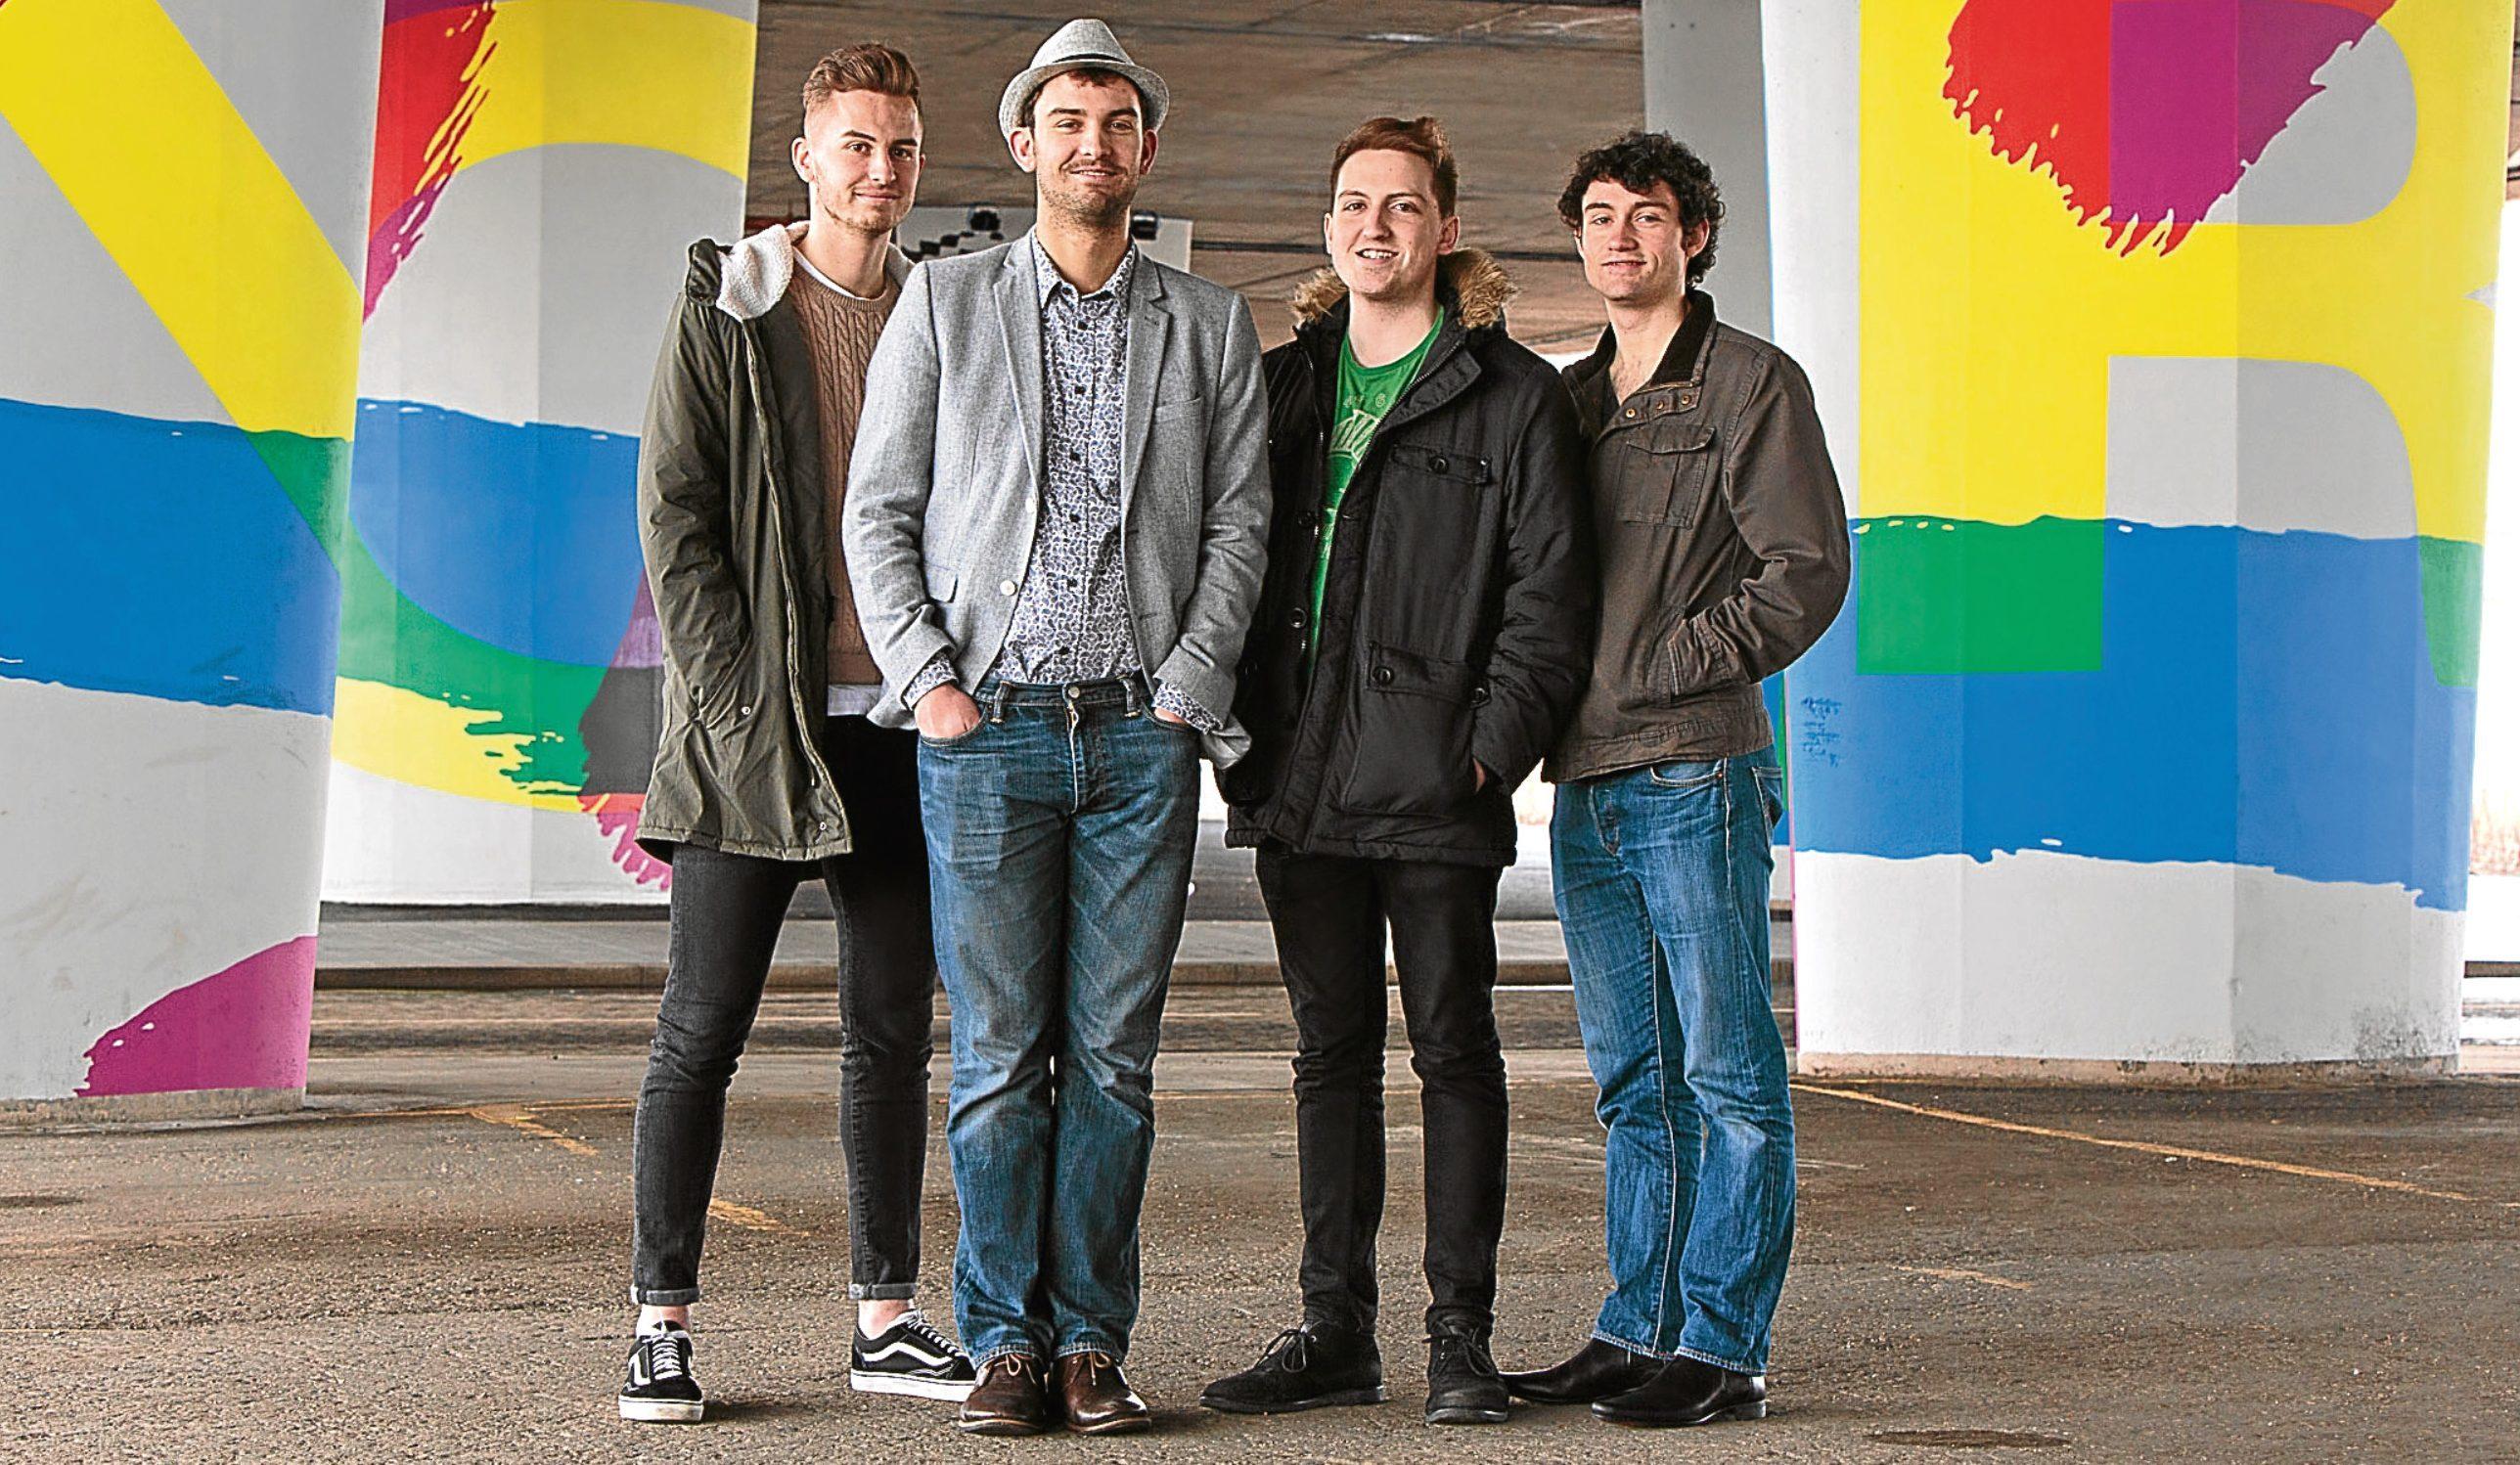 Band members Paul Weir, Craig Weir, Josh Landsburgh and Ross White